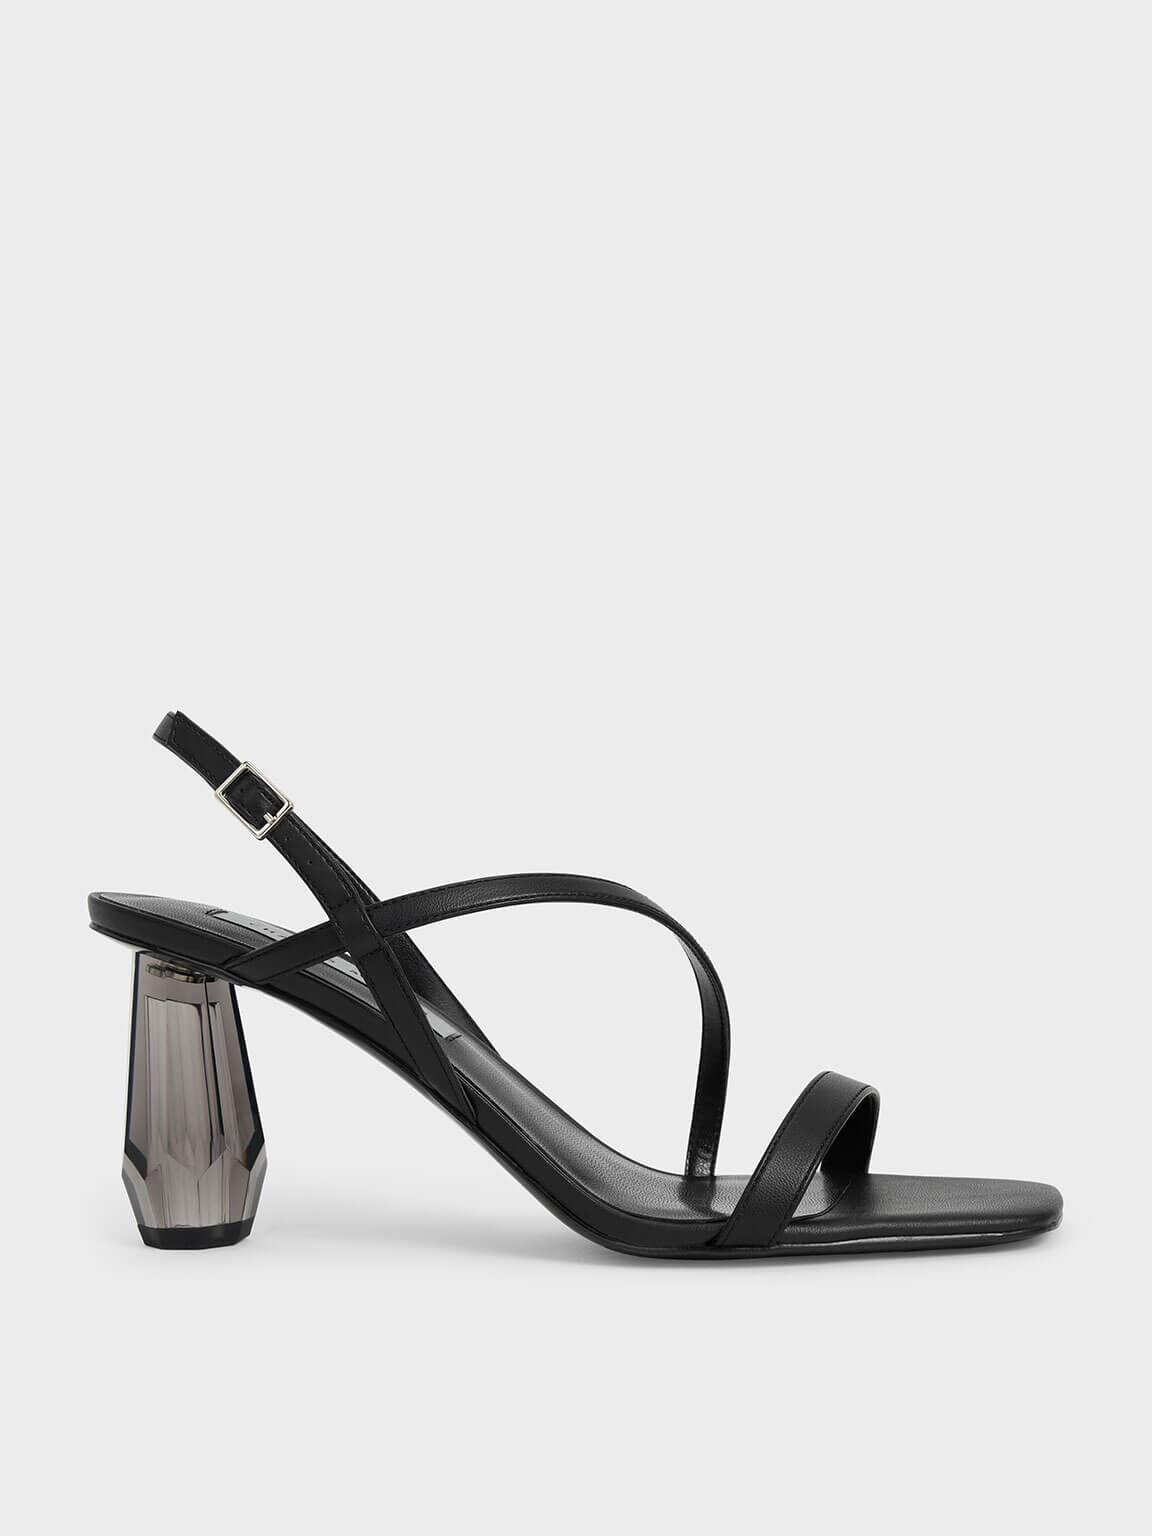 Sandal See-Through Sculptural Heel, Black, hi-res